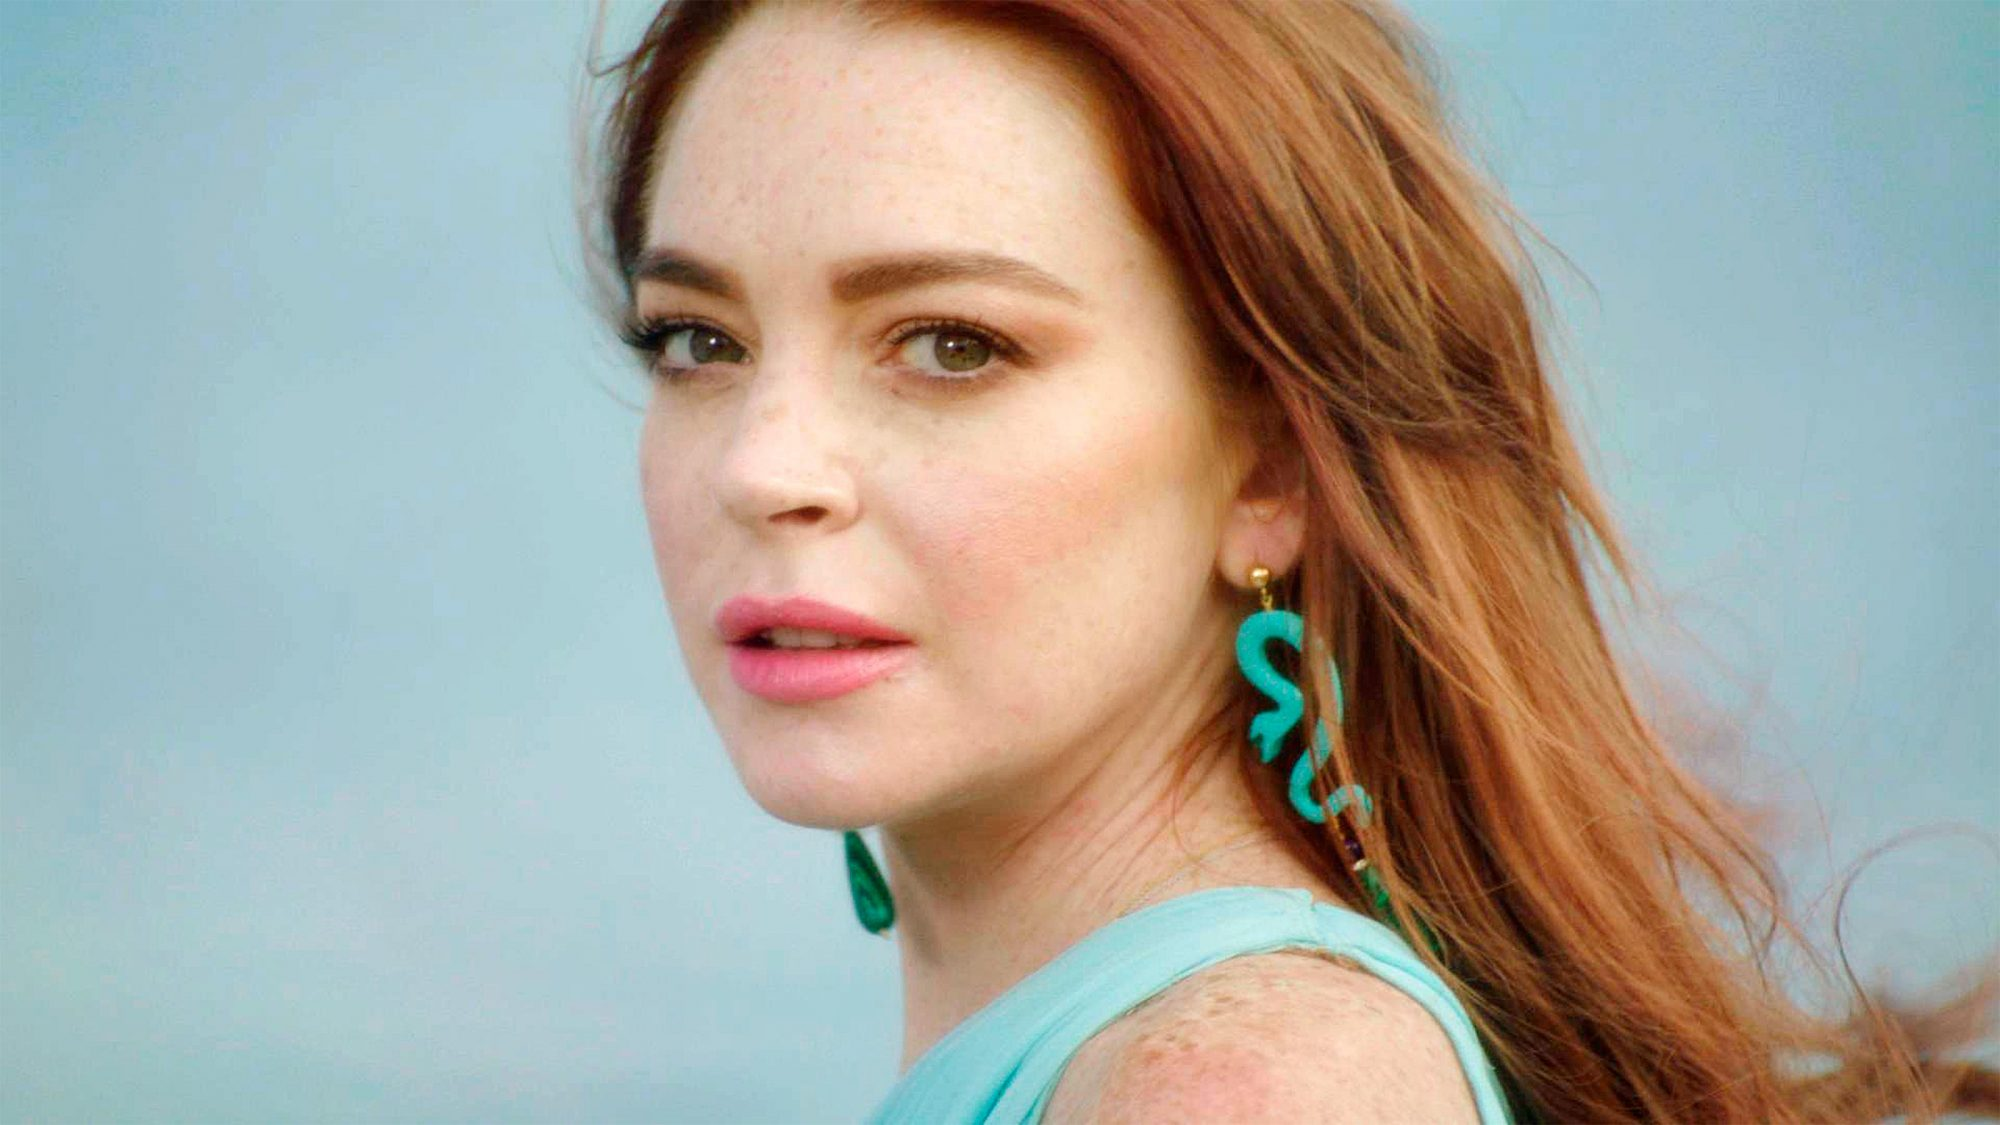 Lindsay Lohan Beach ClubPictured: Lindsay Lohan